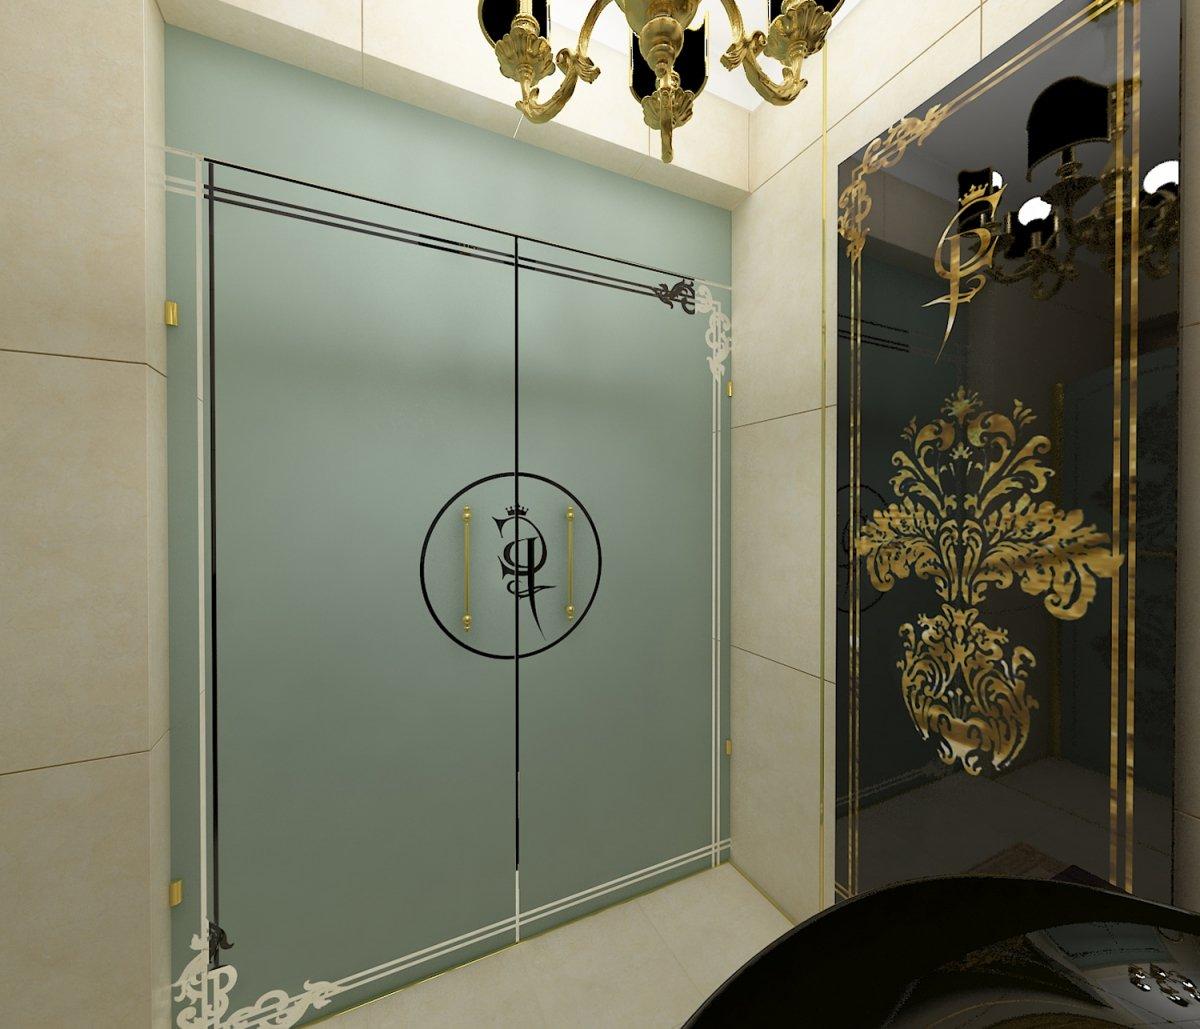 Design interior si amenajare interioara pentru o casa - Chic-15